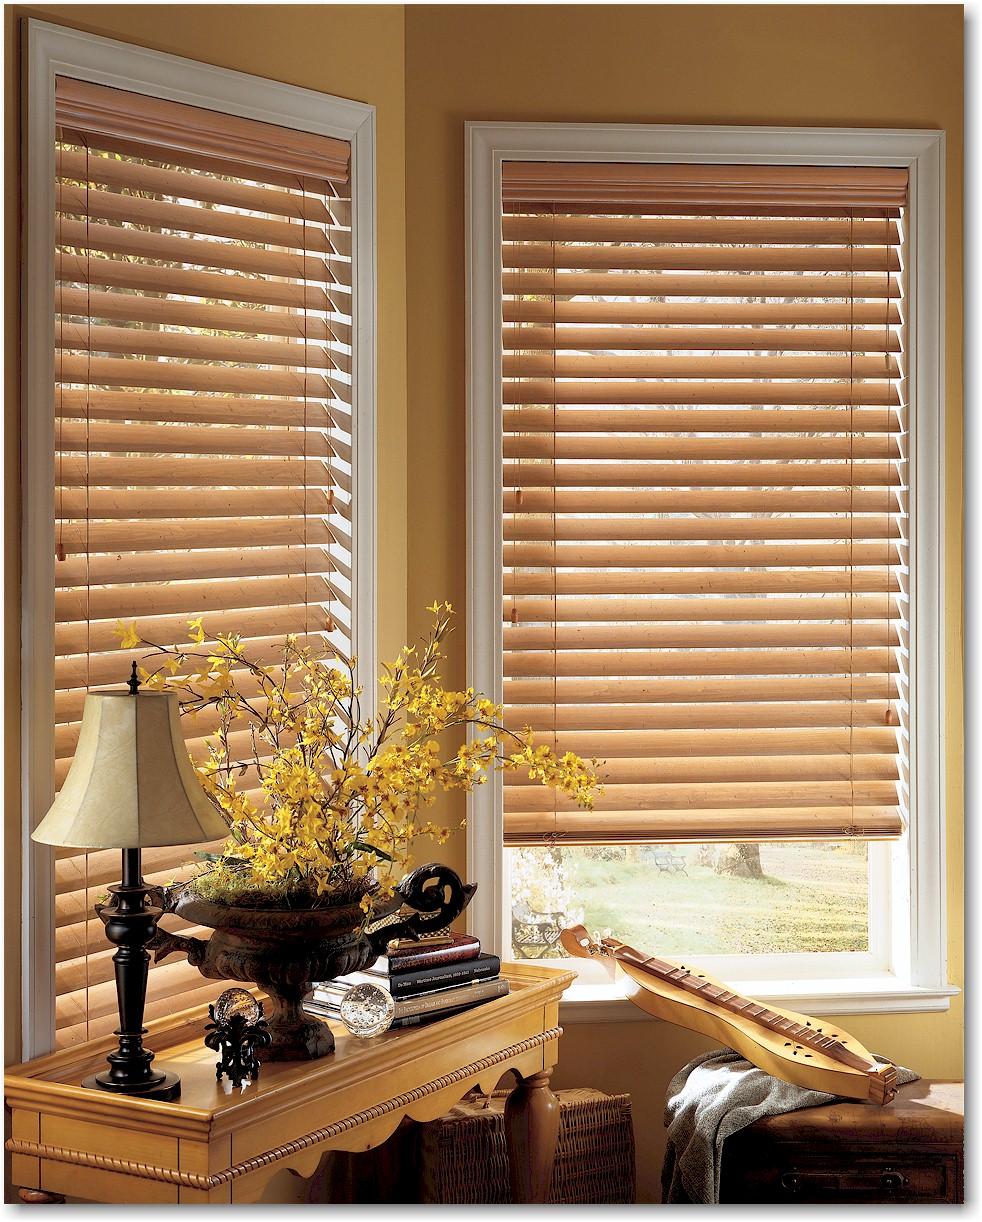 hunter shades s coverings shutters wood canada and hunterdouglas articles lowe douglas window alternative blinds